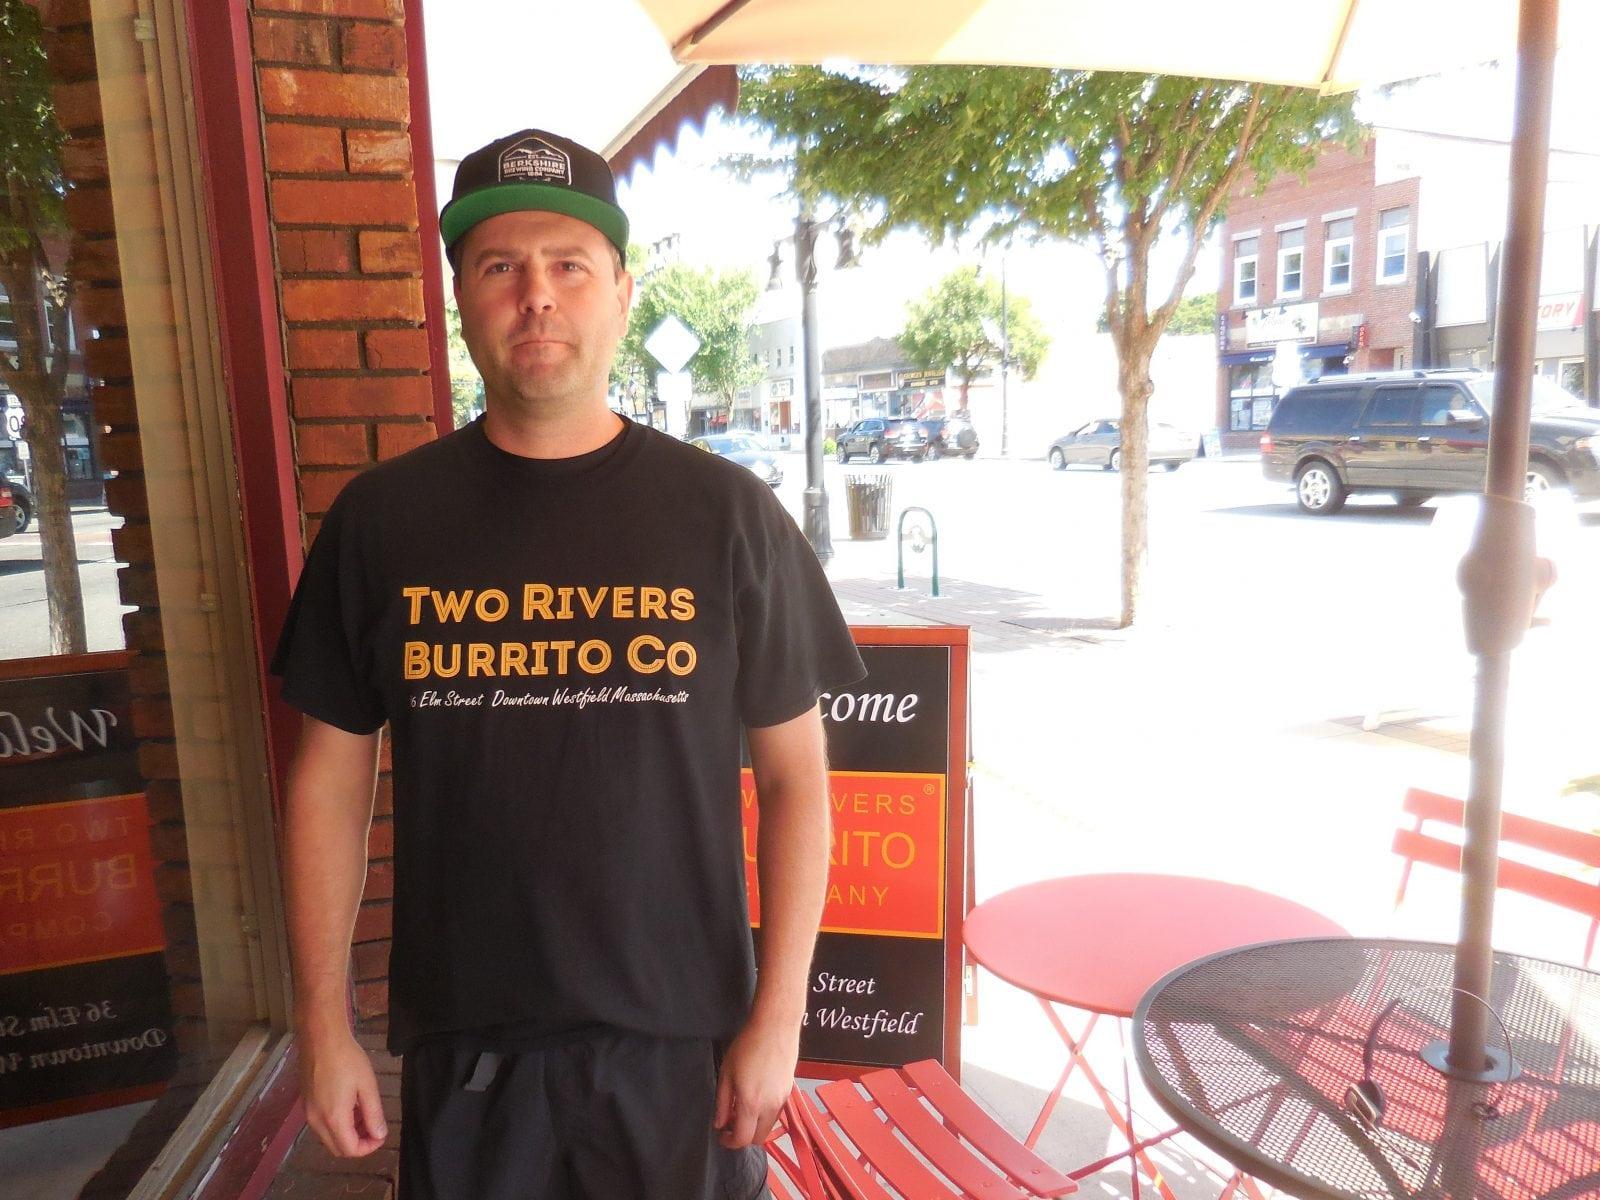 Joe Wynn of Two Rivers Burrito Company - The Westfield News